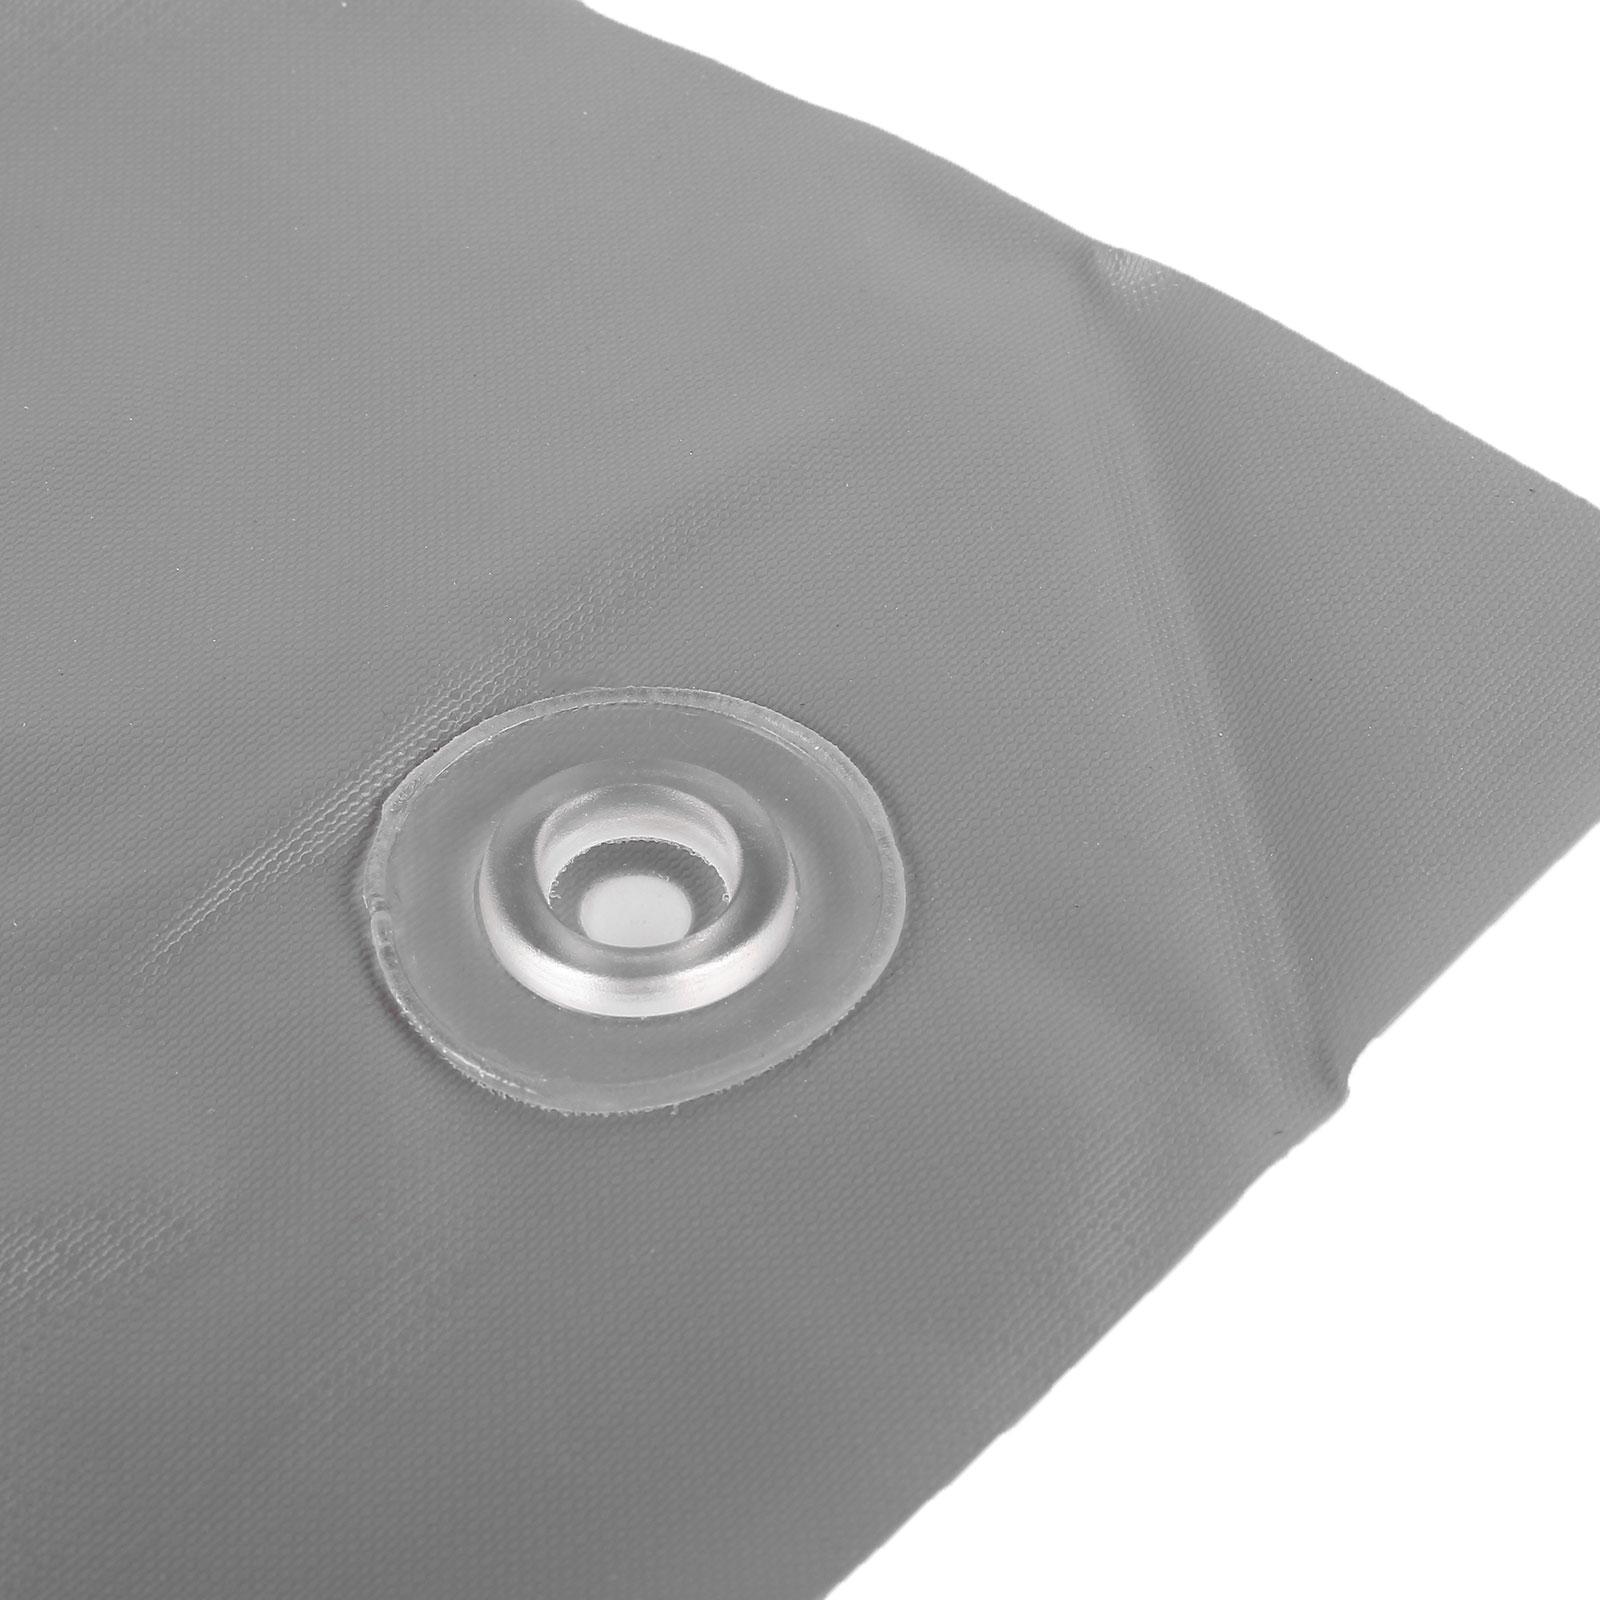 wamovo  Air dam 250 x 600 grau Ränder aufblasbar PVC (400 g/qm)